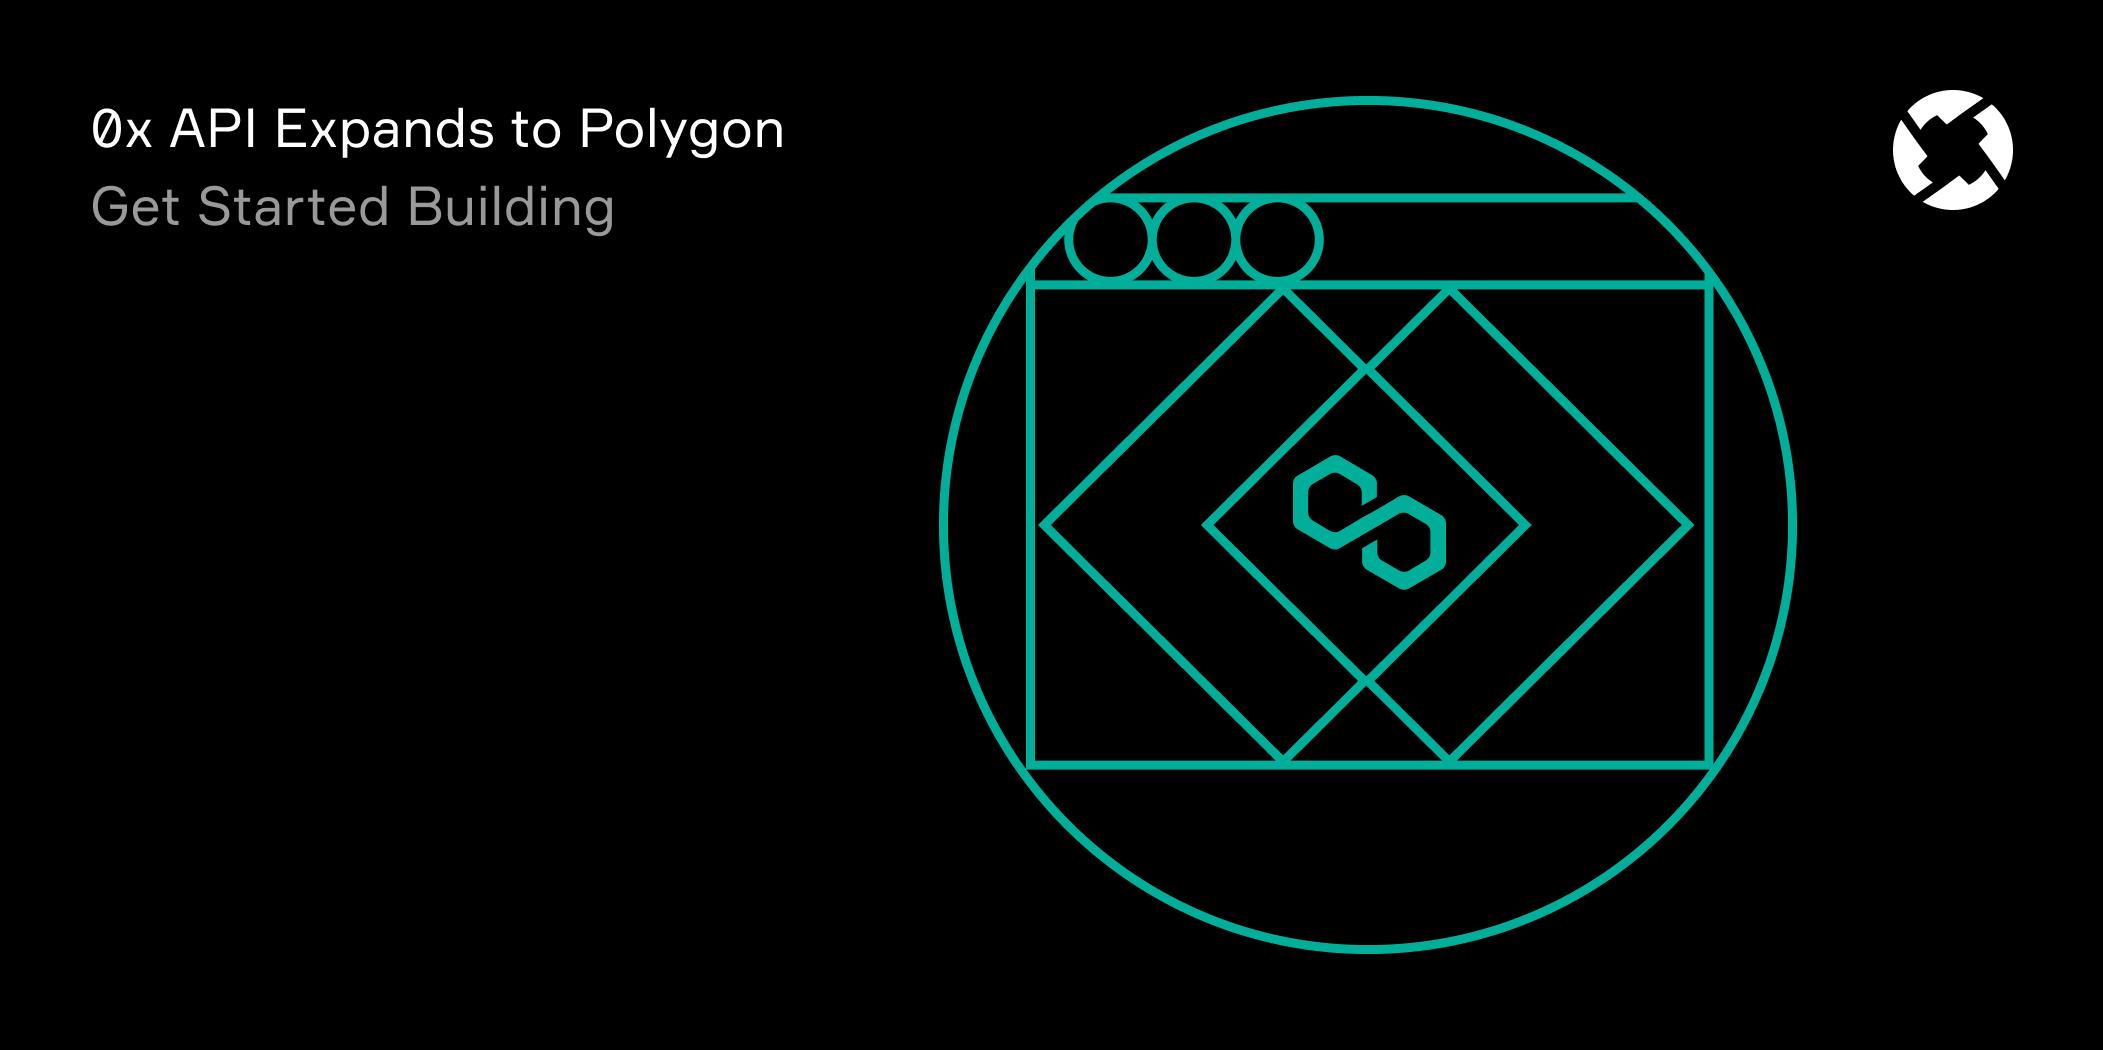 0x Releases API on Polygon